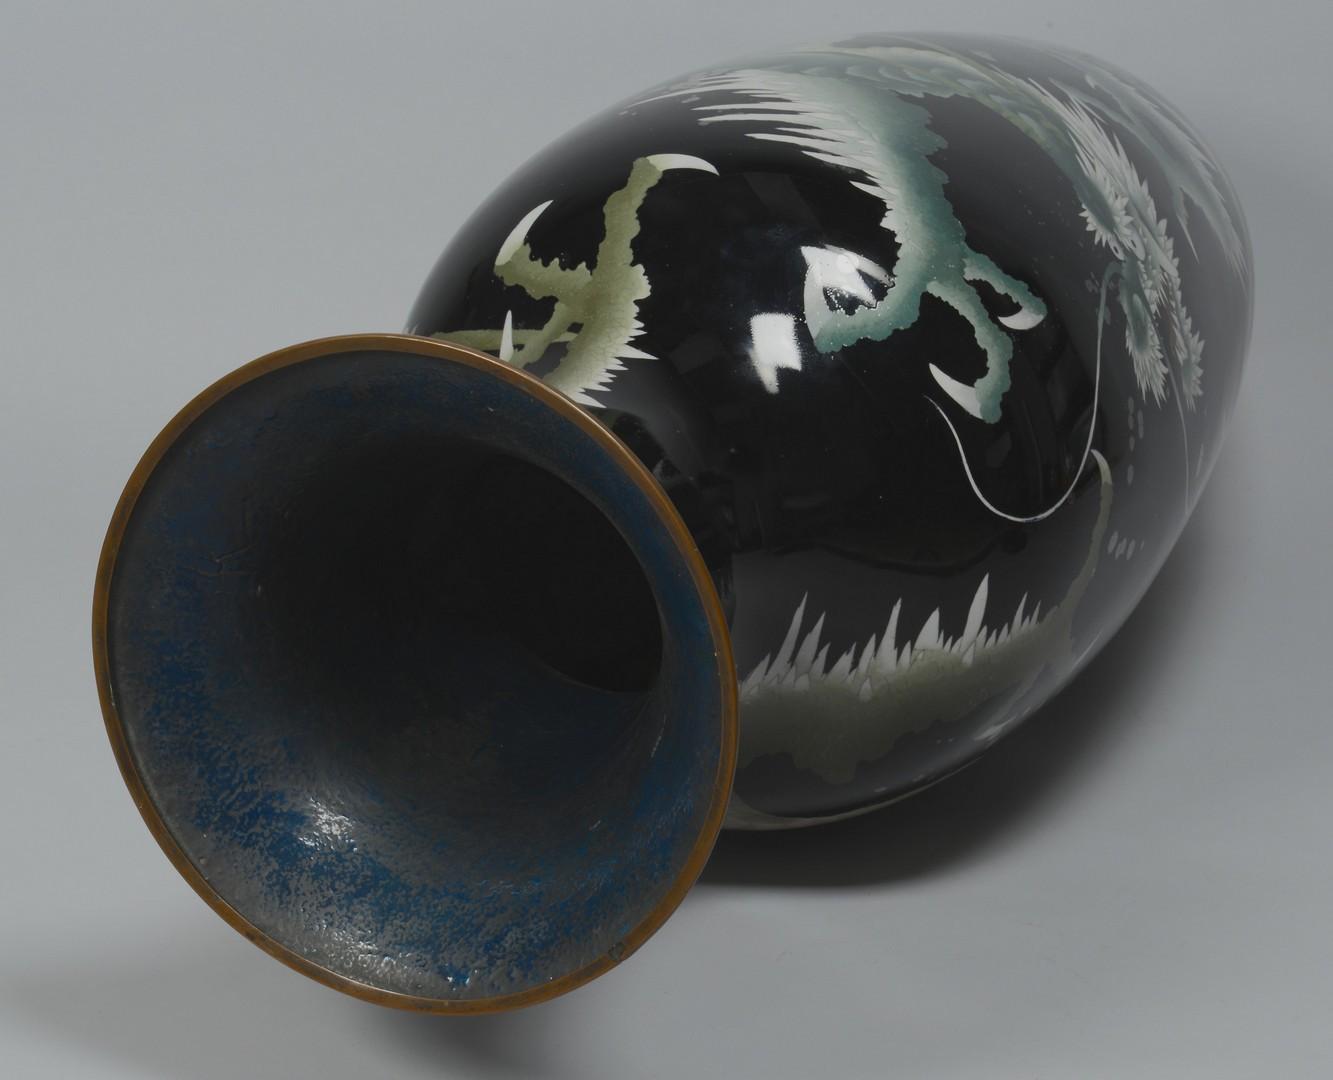 Lot 3383206: Large Asian Cloisonne Floor Vase w/ Green Dragon